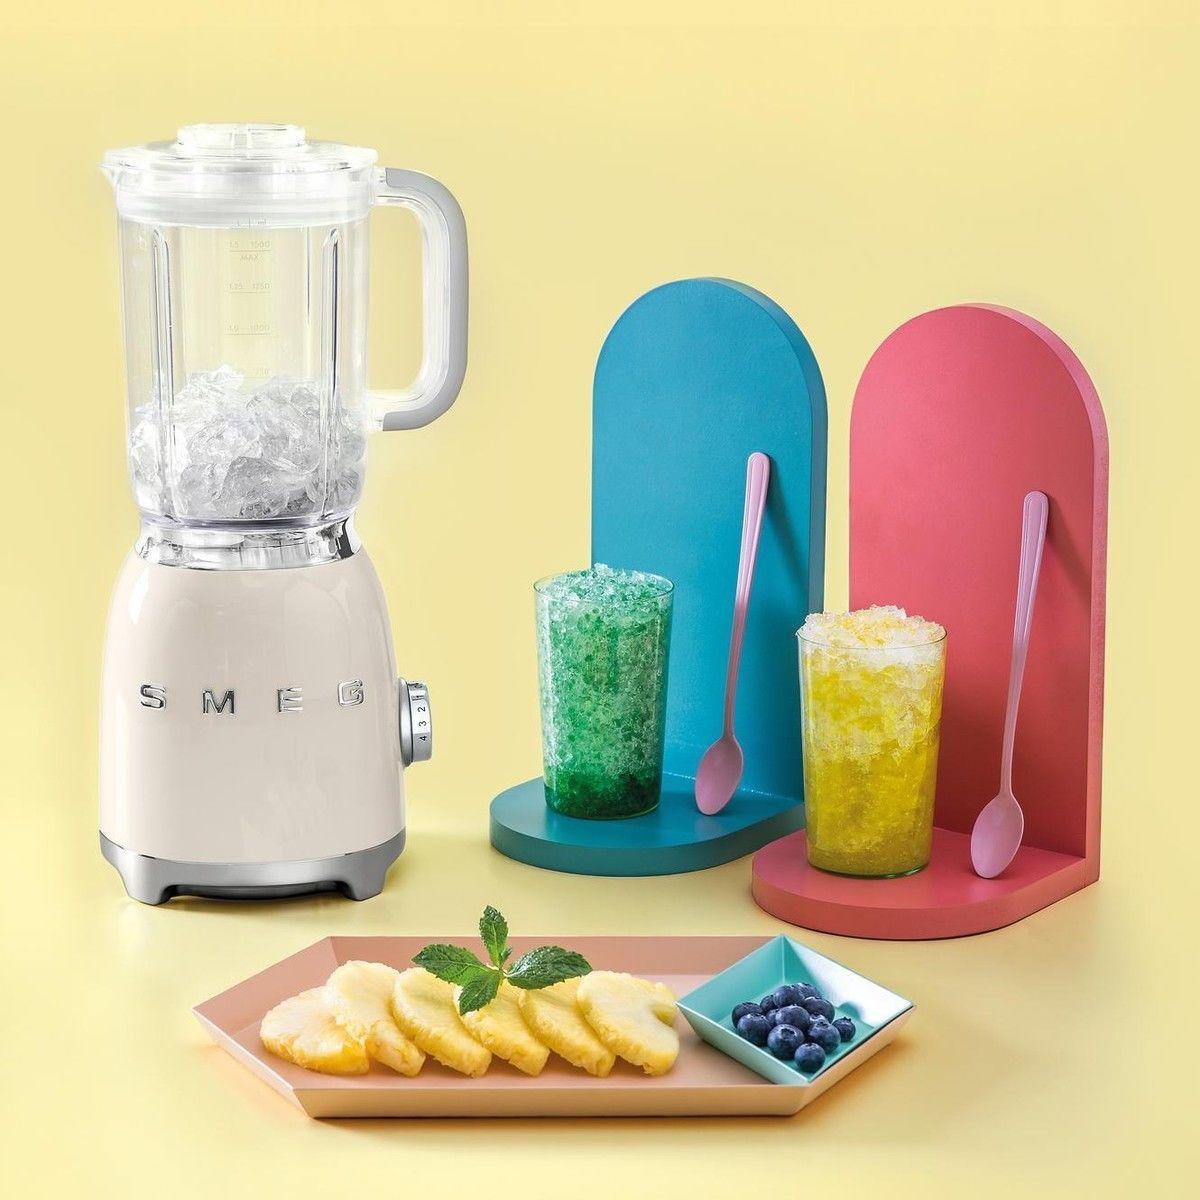 Smeg blf01 blender 1 5l smeg smeg consumer products - Smeg productos ...